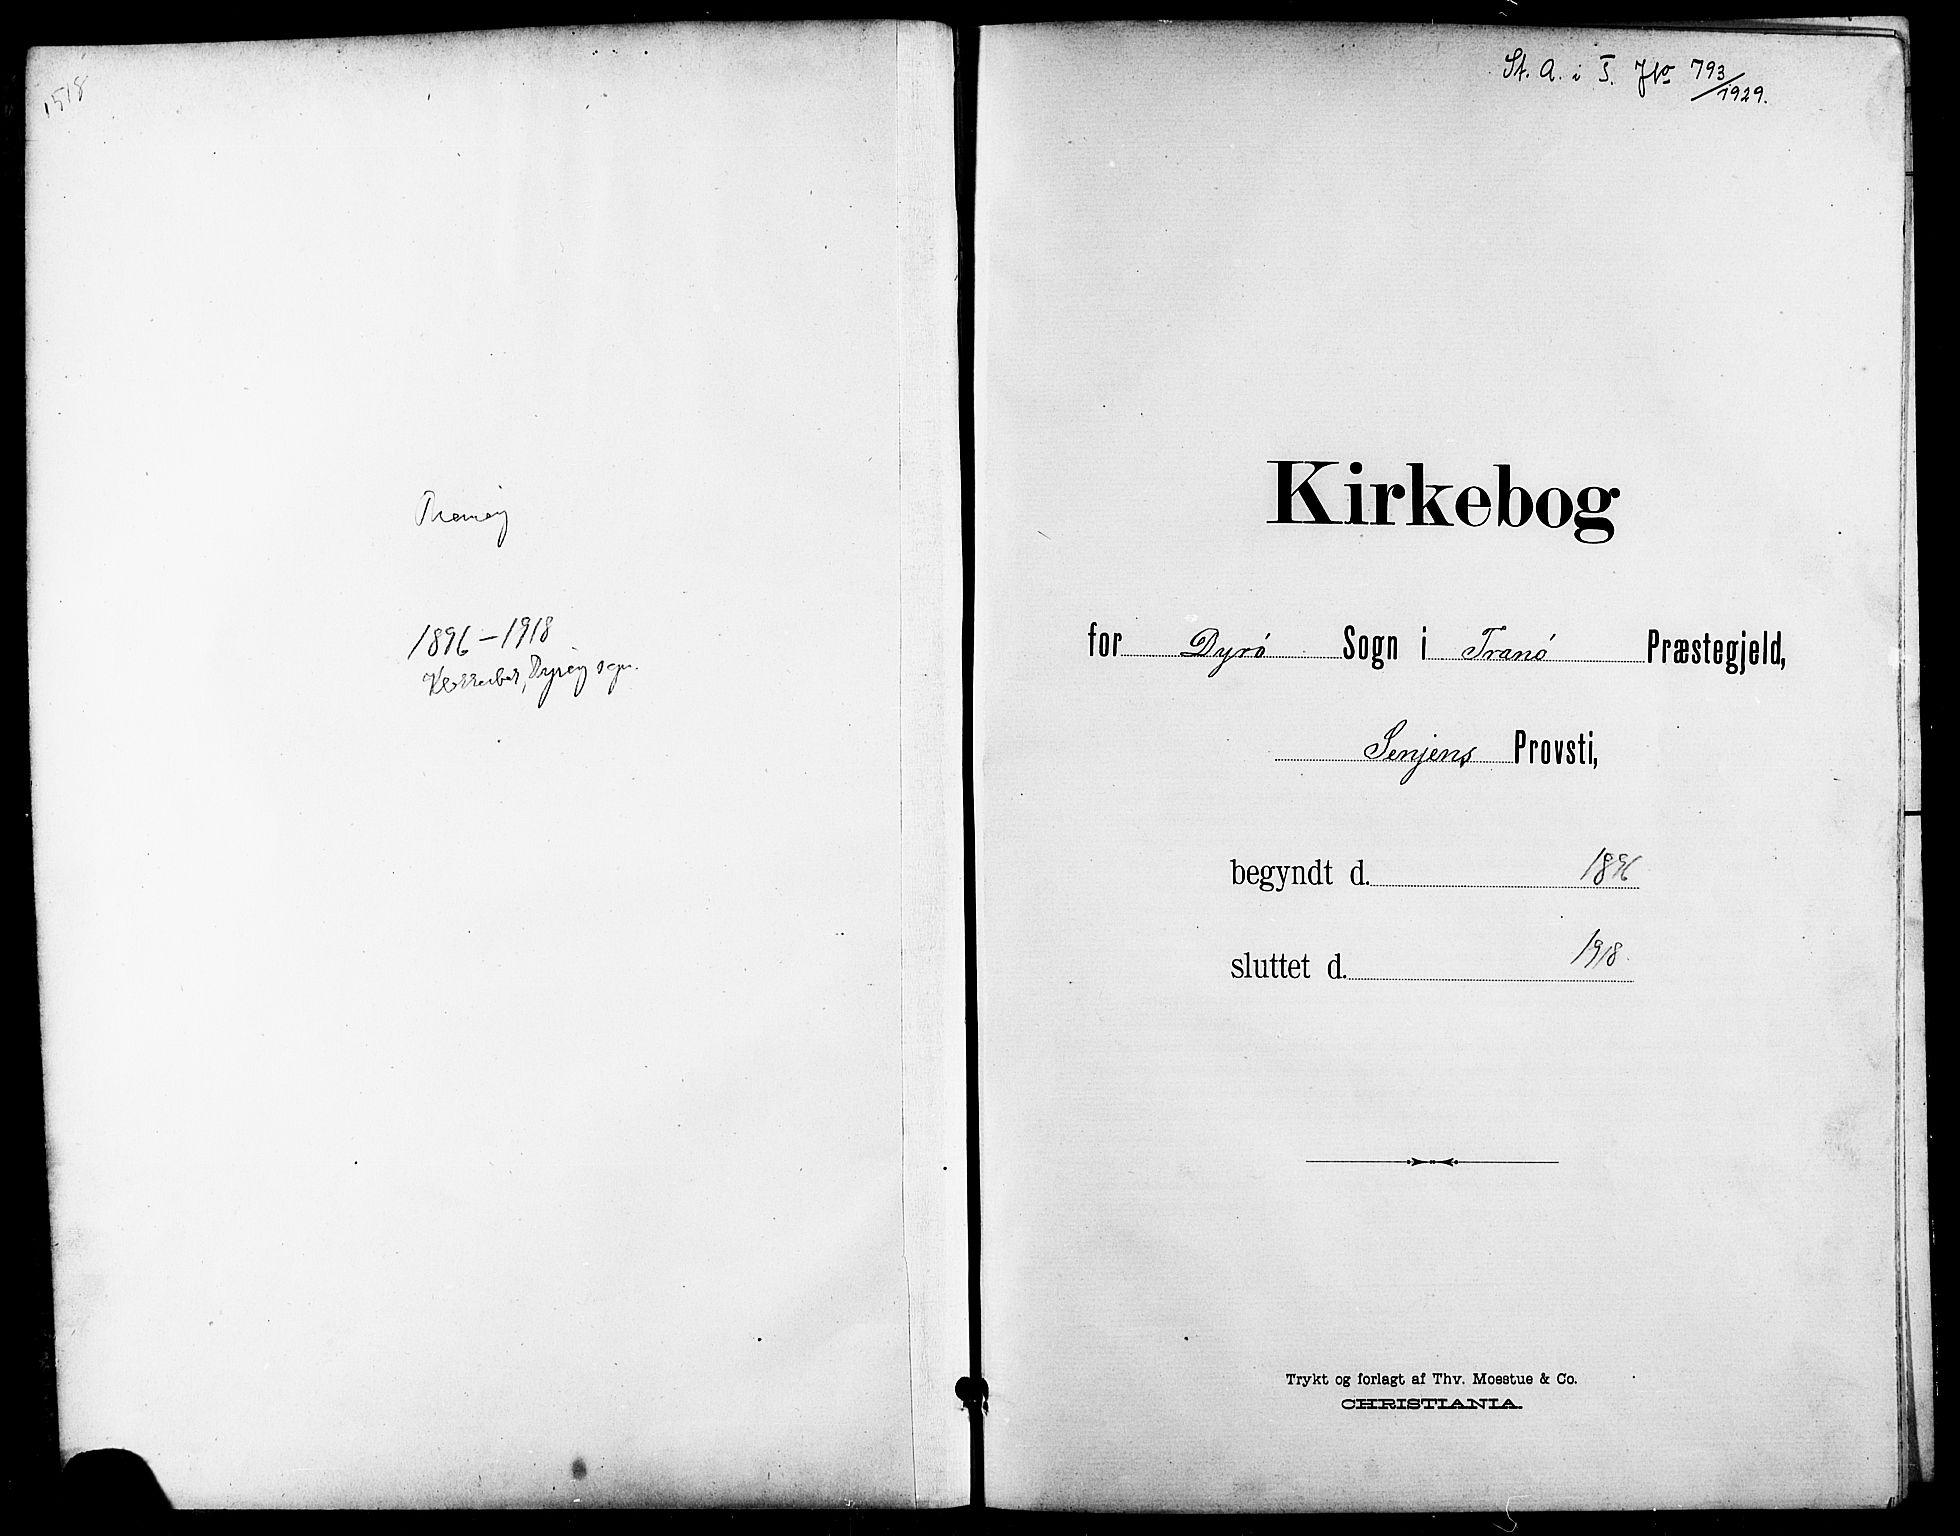 SATØ, Tranøy sokneprestkontor, I/Ia/Iab/L0014klokker: Klokkerbok nr. 14, 1896-1918